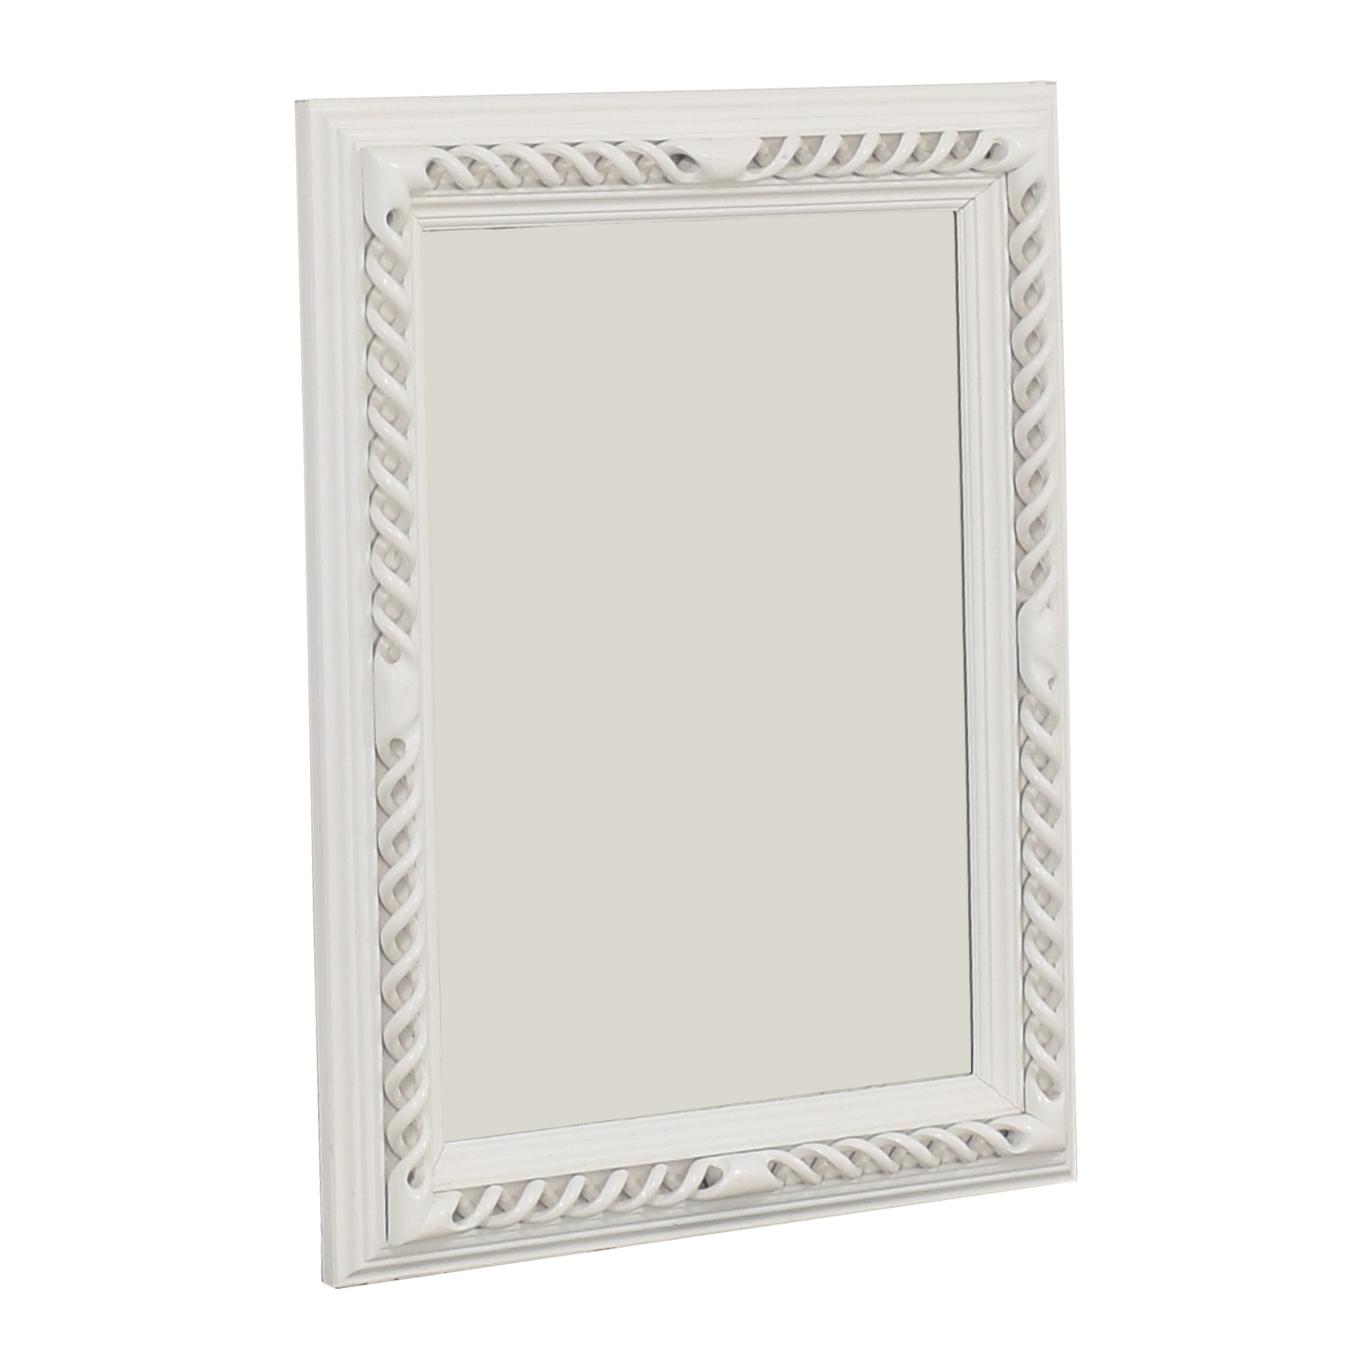 Anthropologie Framed Mirror / Decor